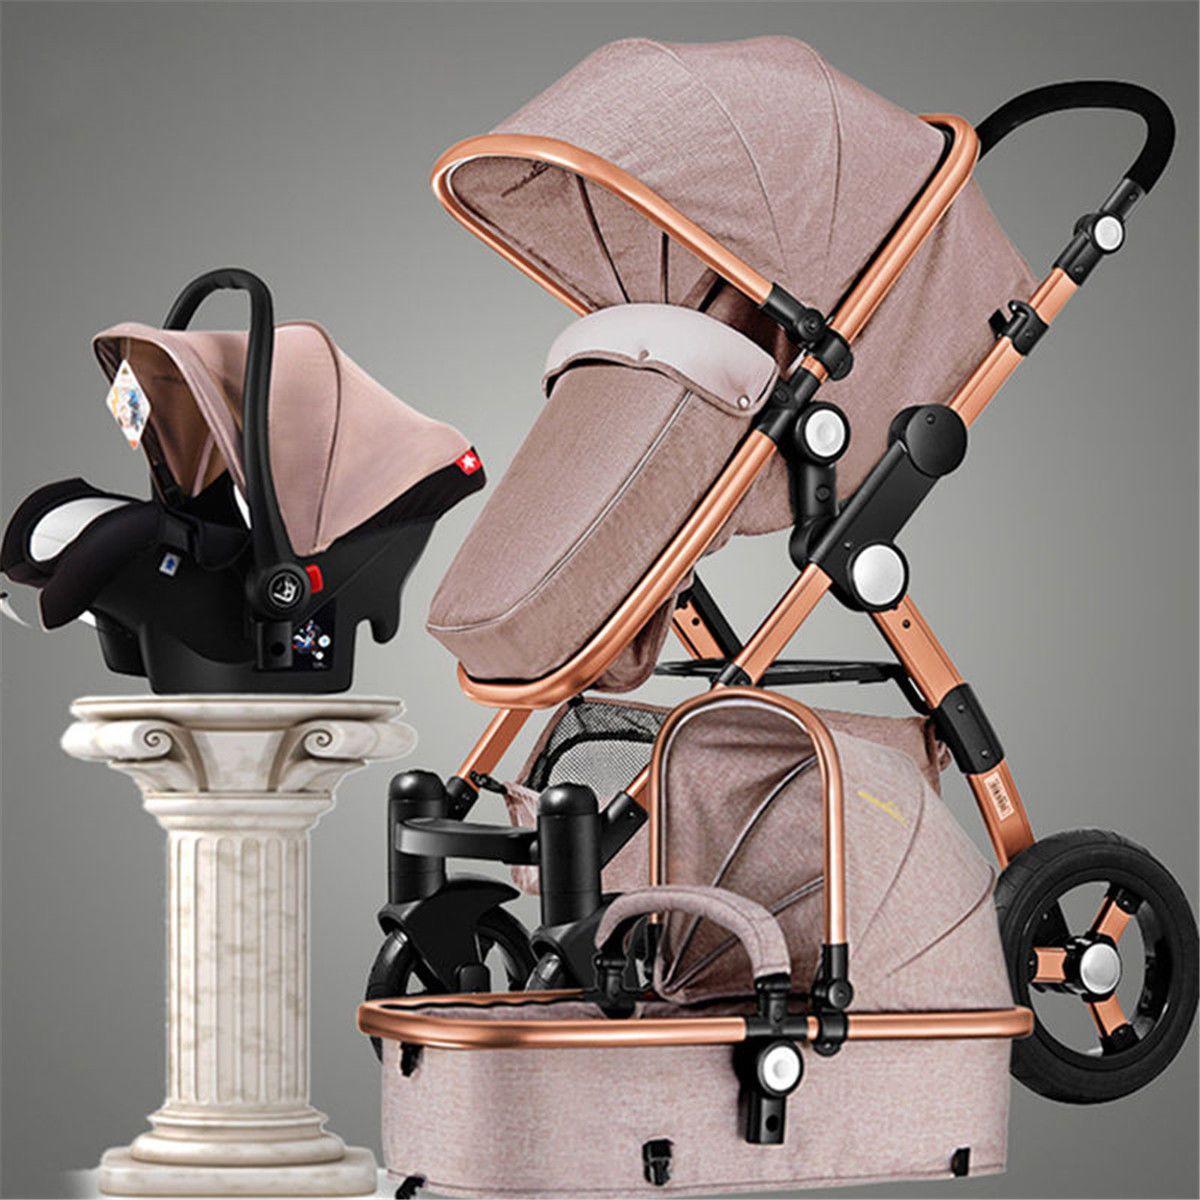 Luxury 3 in 1 Foldable Baby Stroller High View Pram